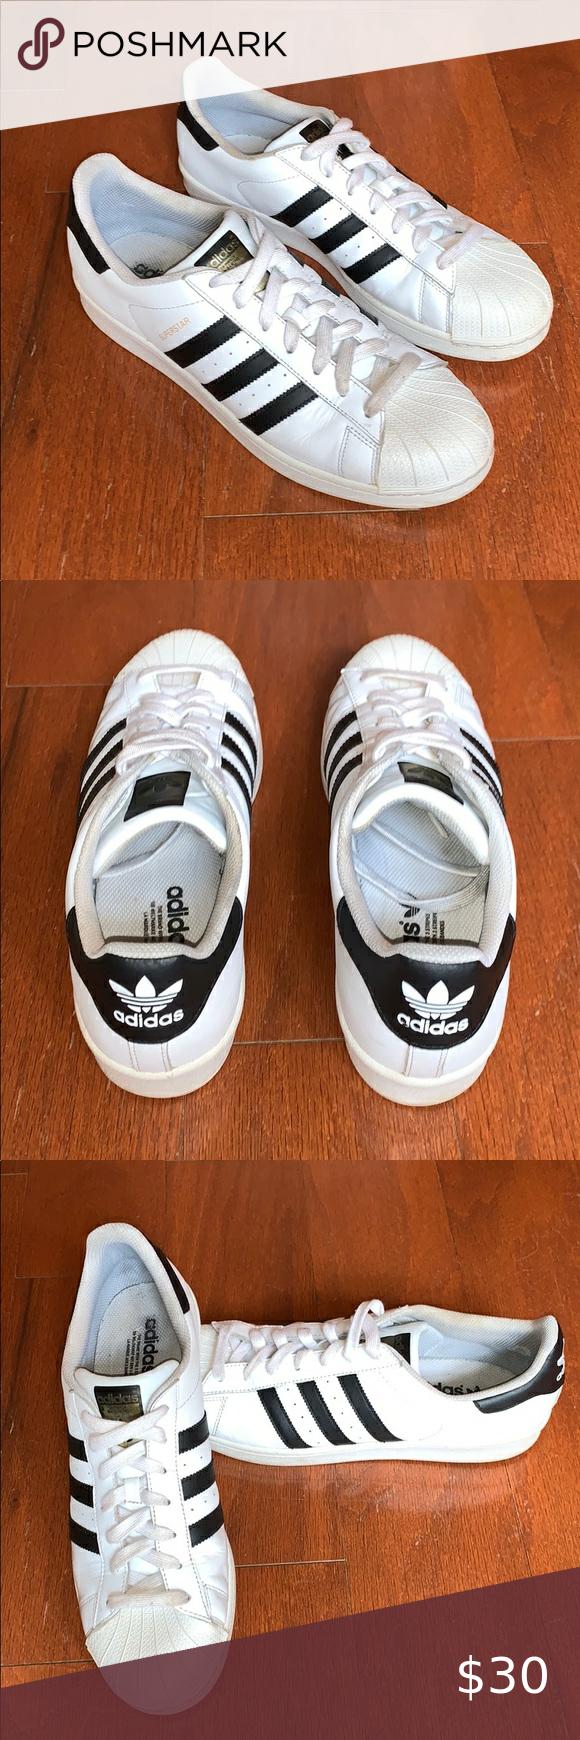 adidas superstars // size men's 11.5 in